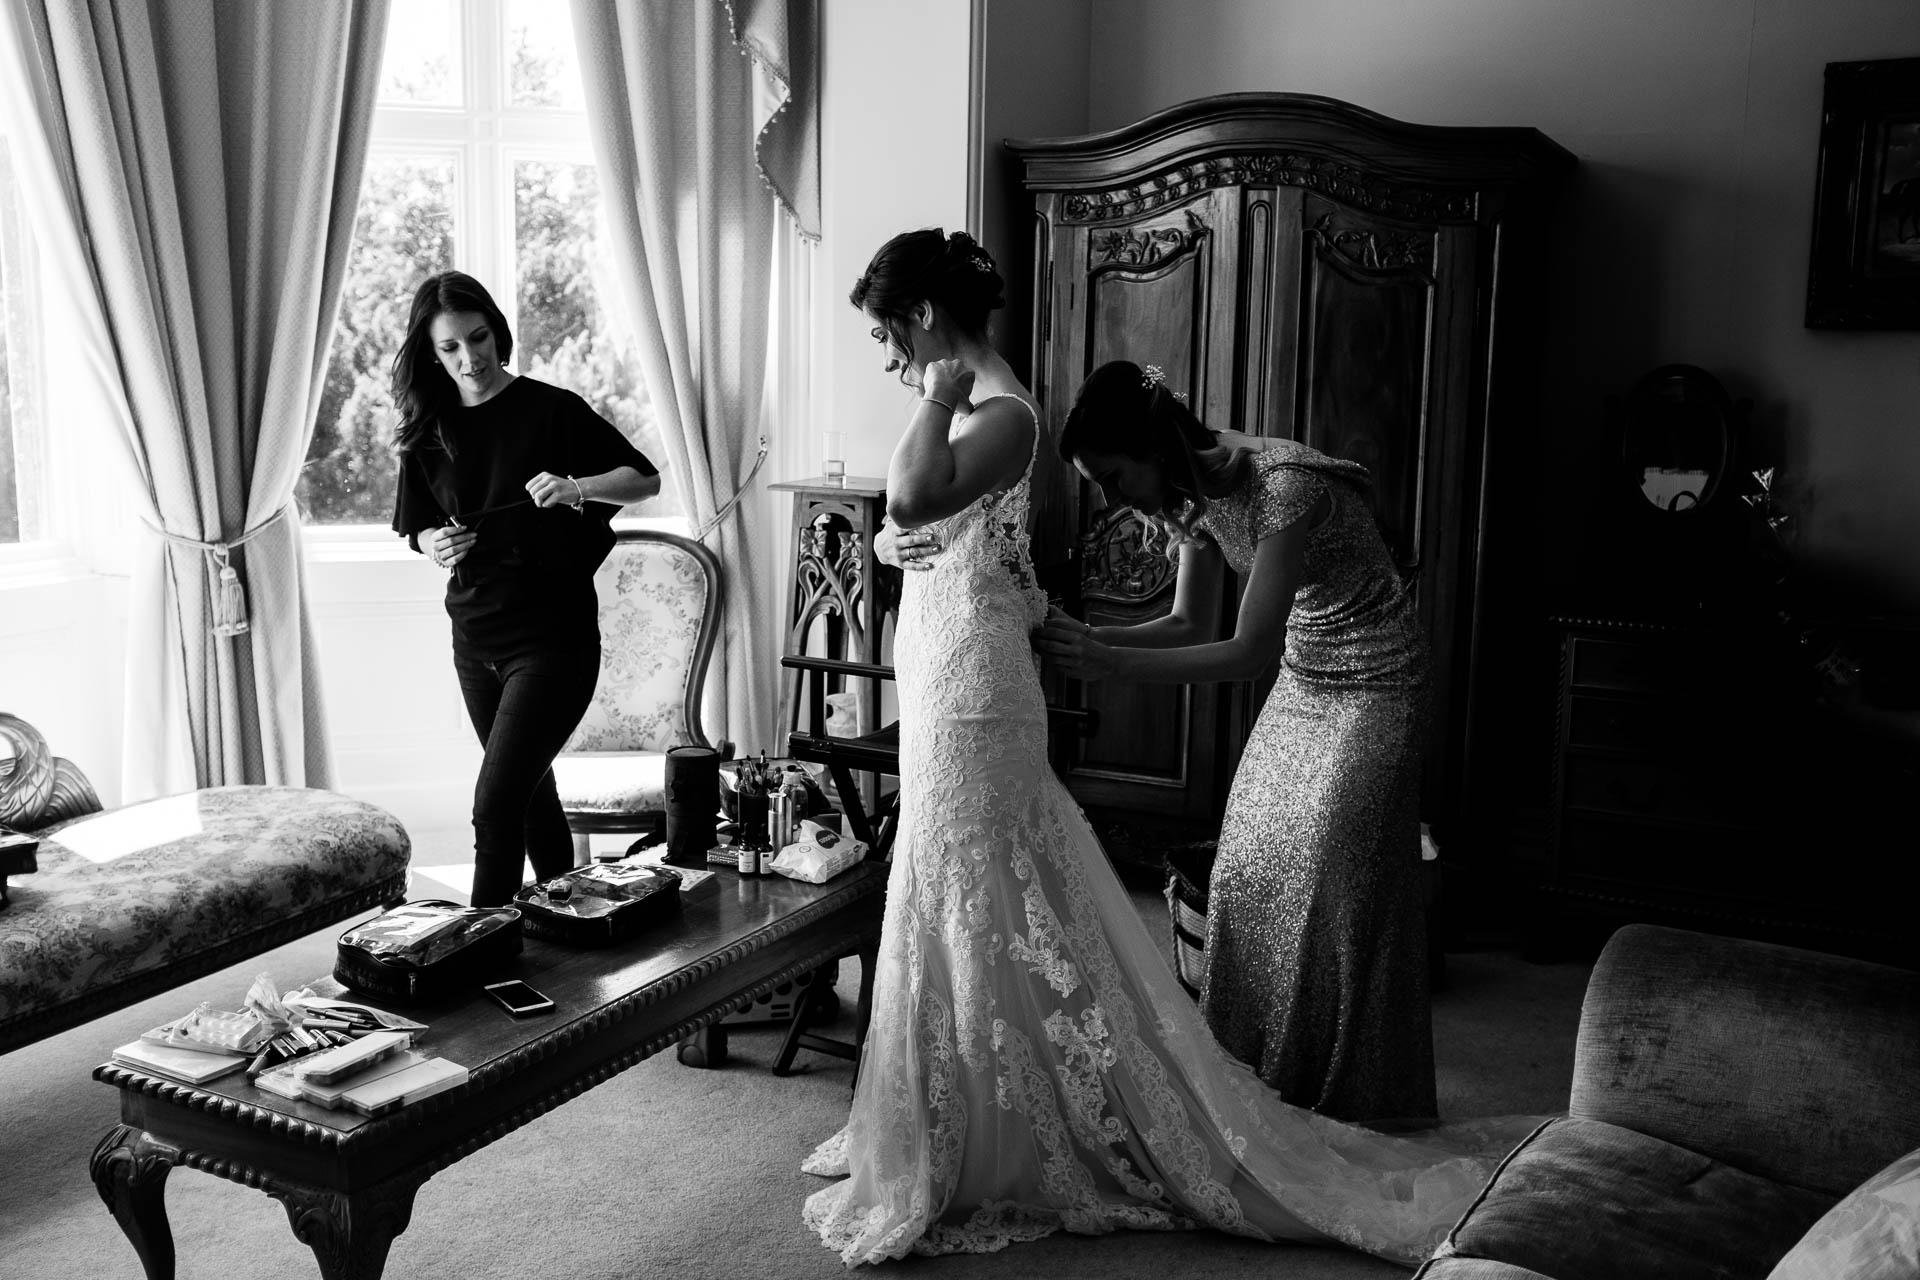 orchardleigh house wedding - Danni & Barney (86).jpg